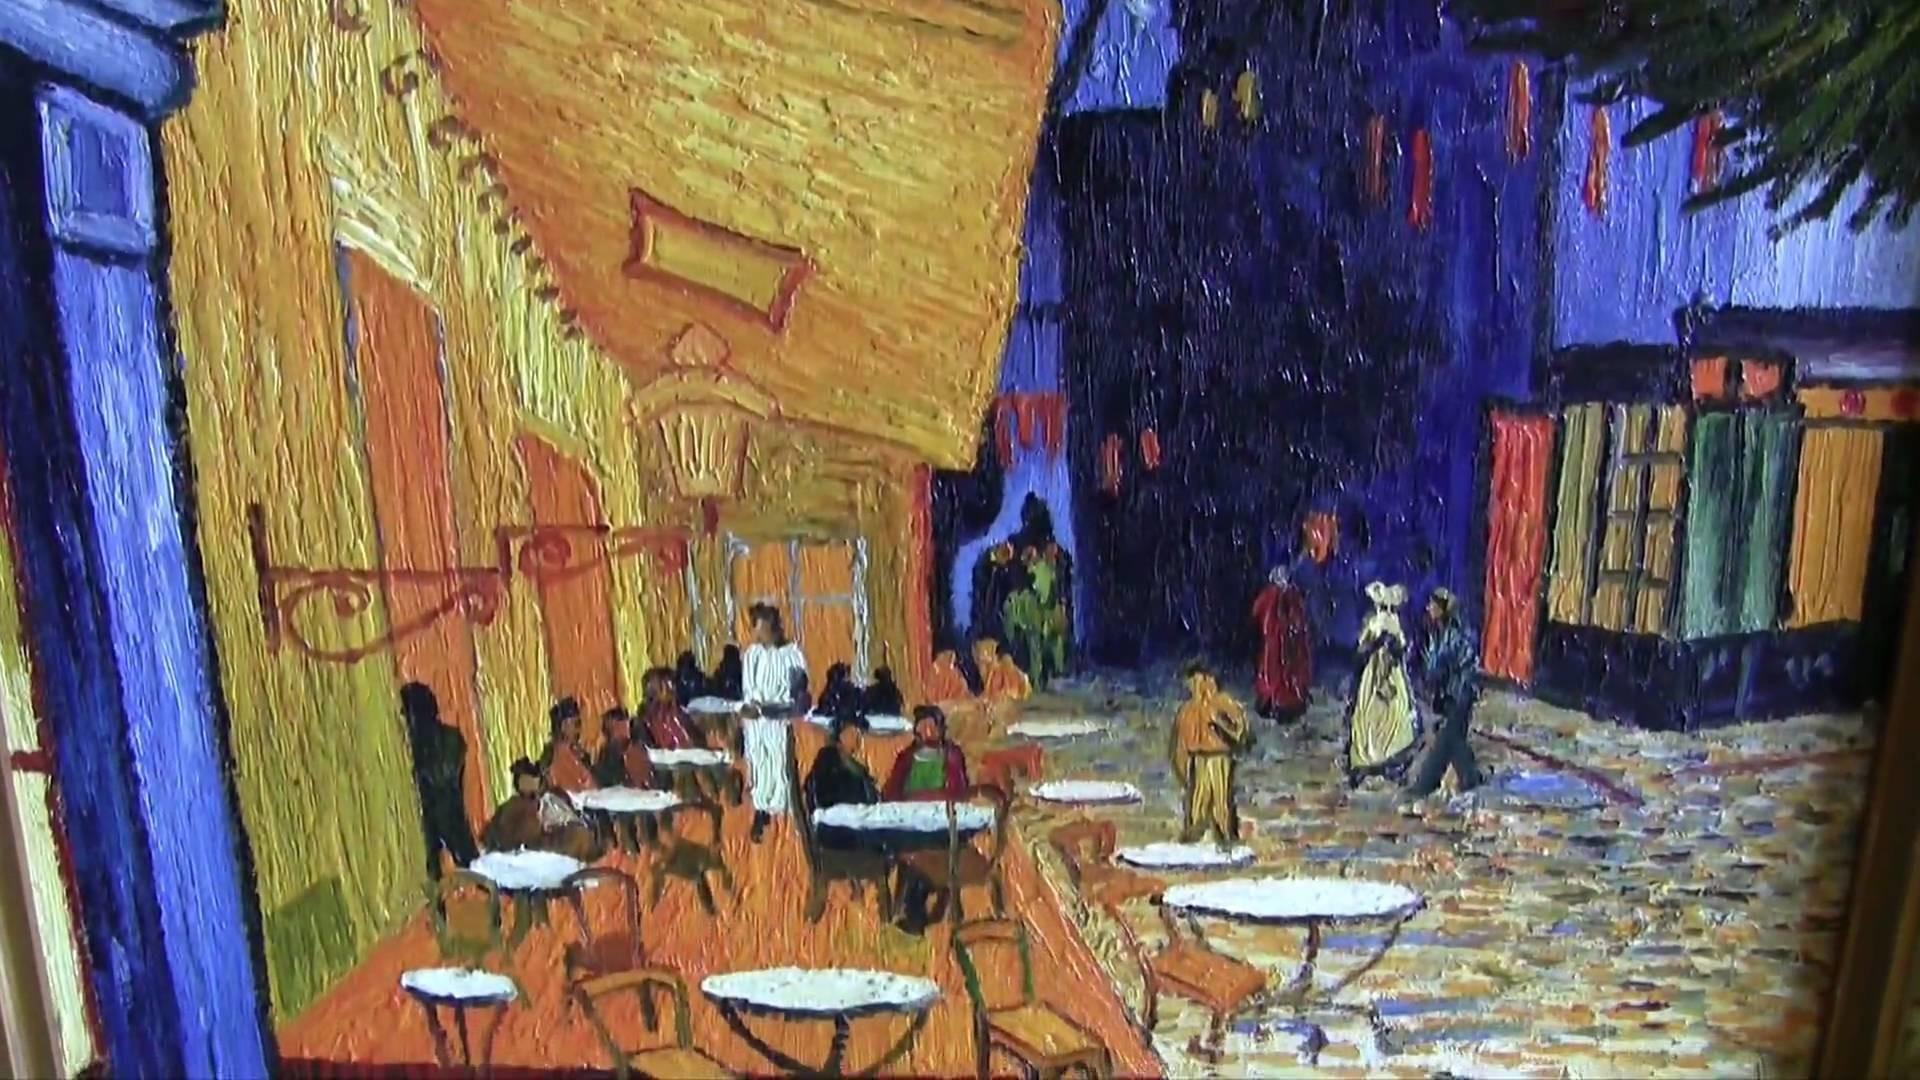 Vincent Van Gogh - Vincent Van Gogh (cafe Terrace At Night) Art Poster -  1920x1080 Wallpaper - teahub.io